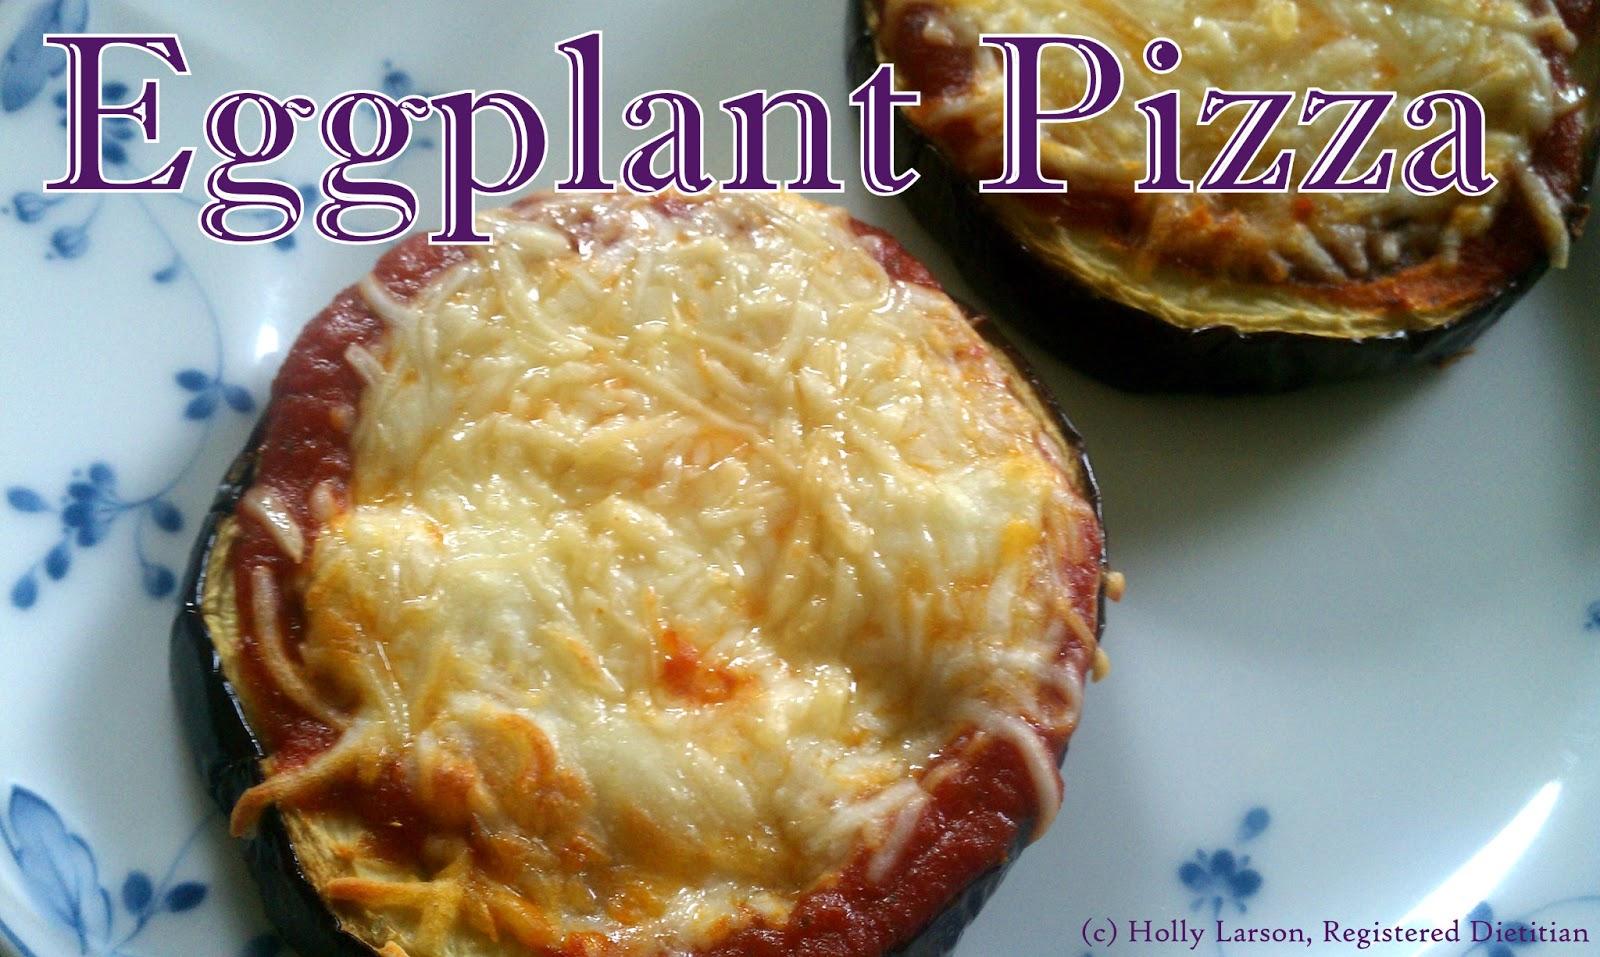 Dinner in a flash: Eggplant mini pizzas